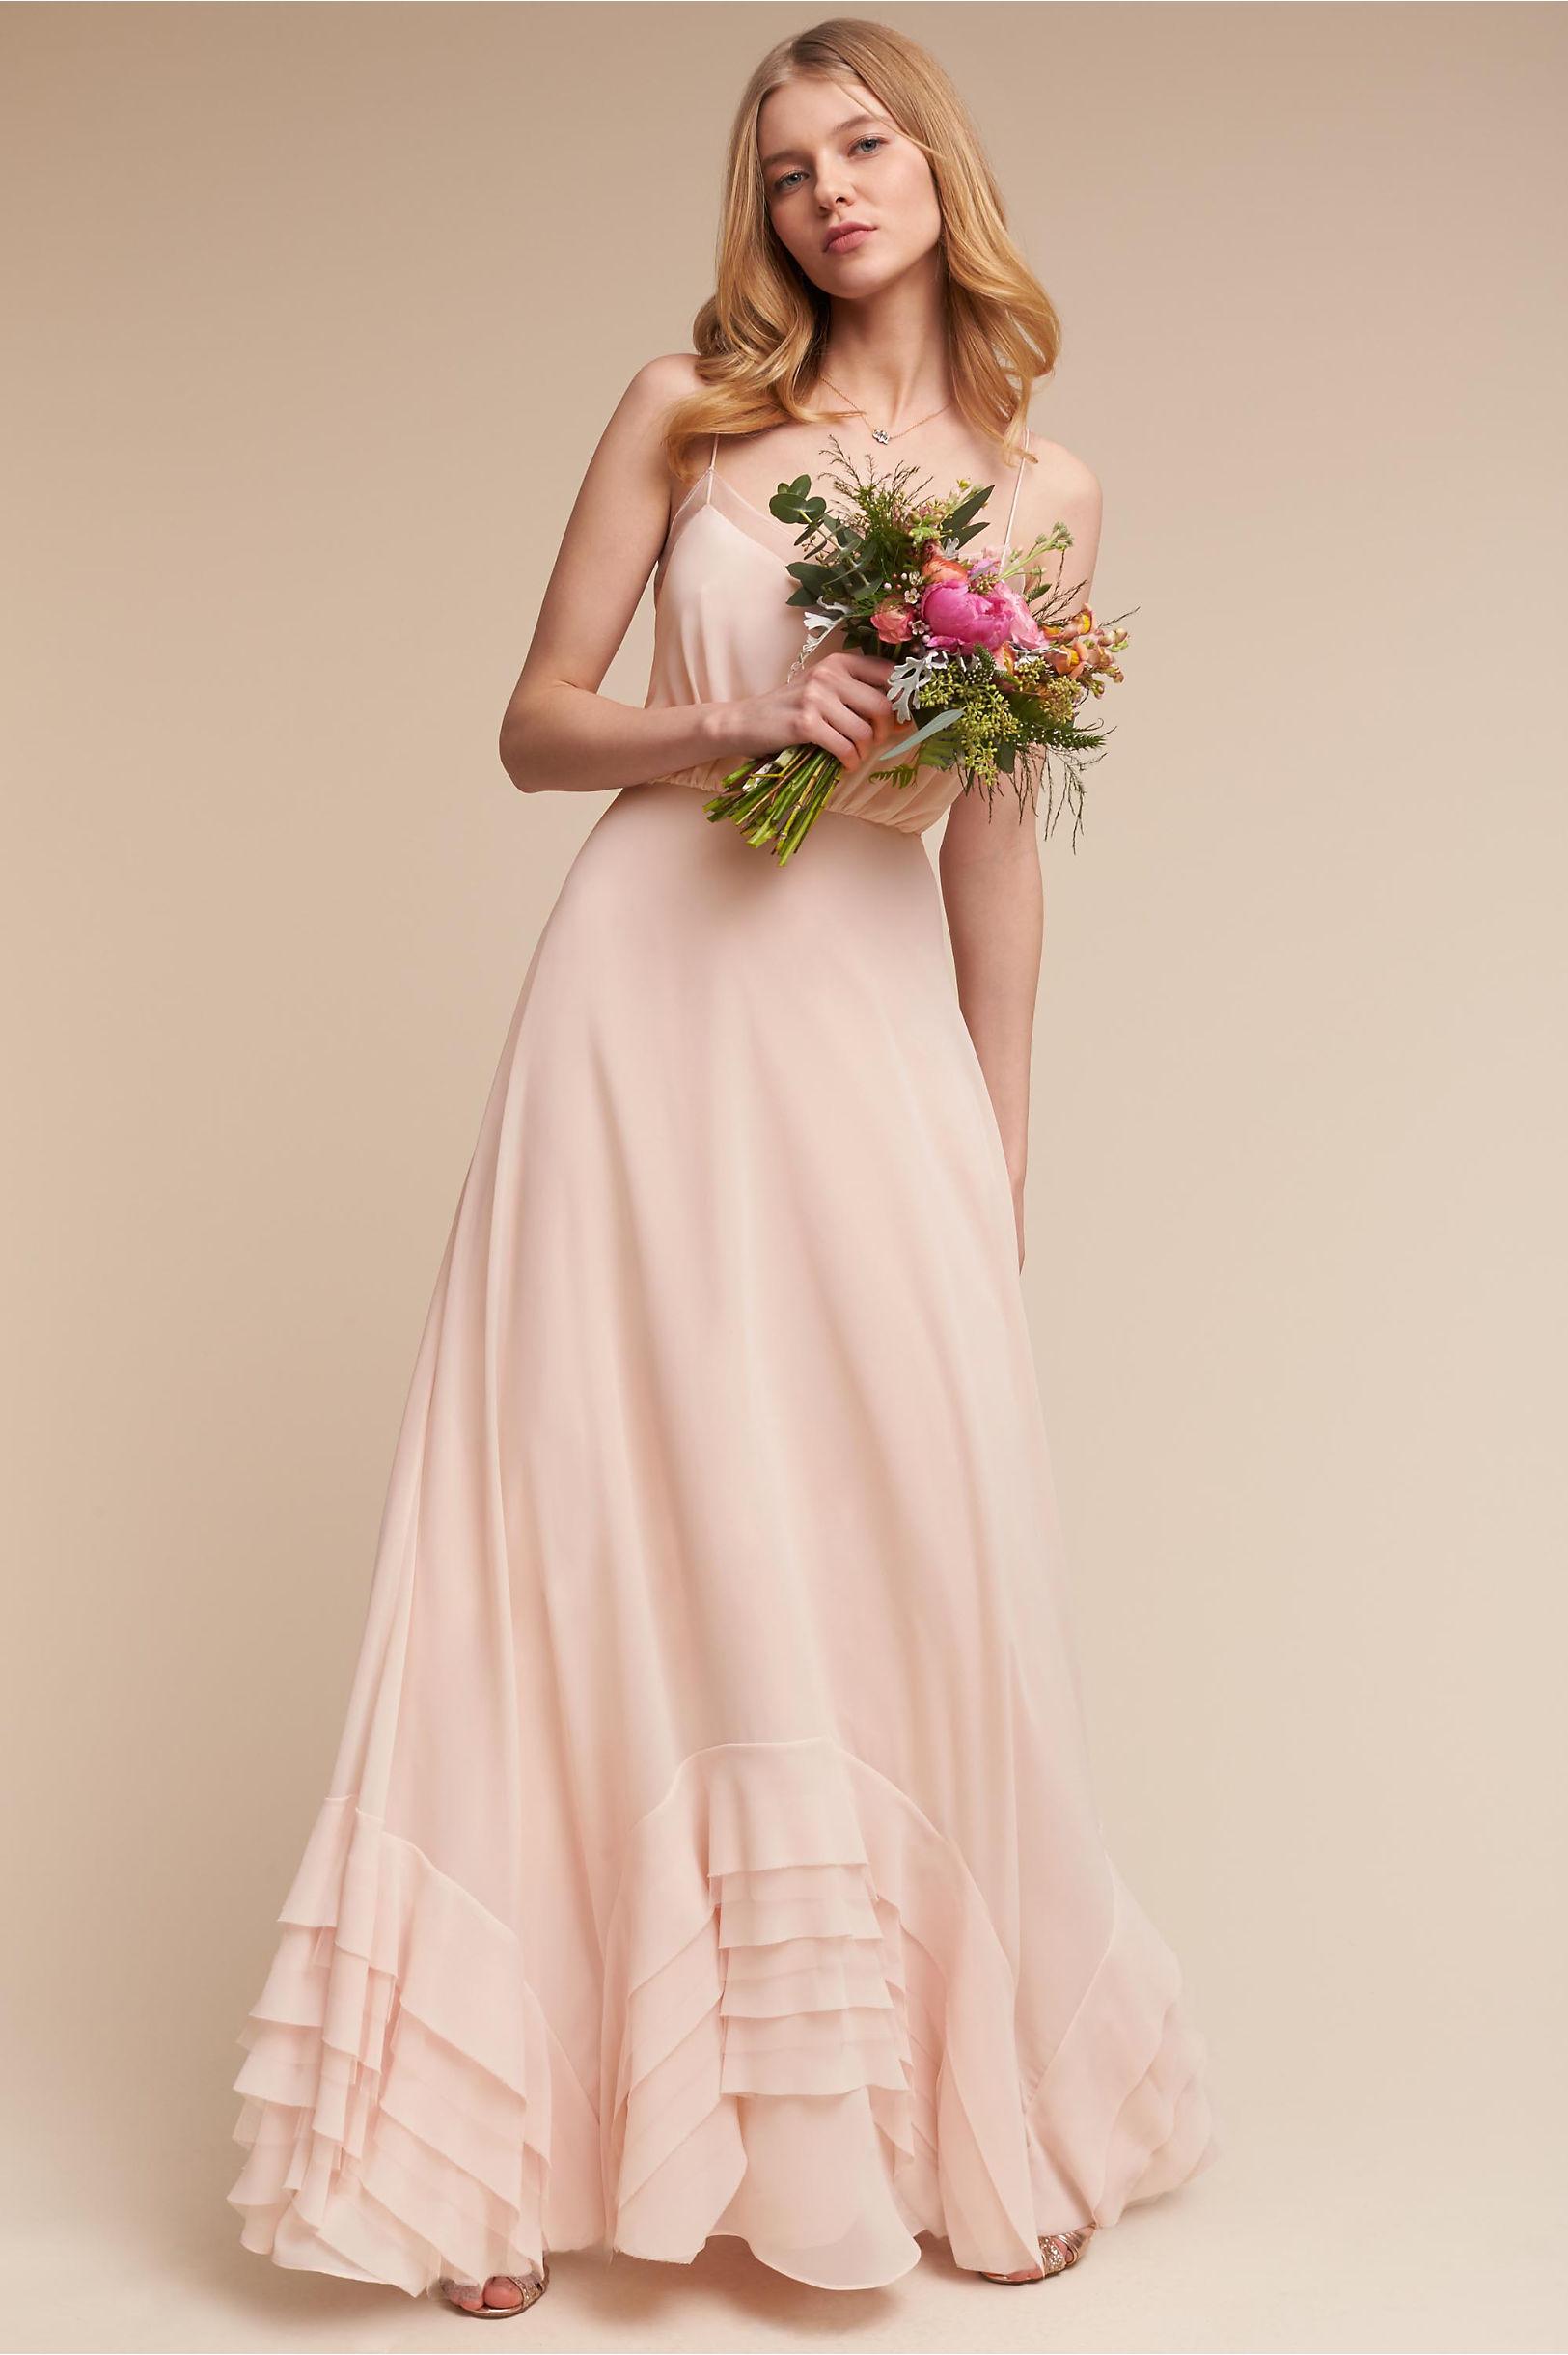 bridal party bridesmaid dresses bridesmaid wedding dresses Dove Dress